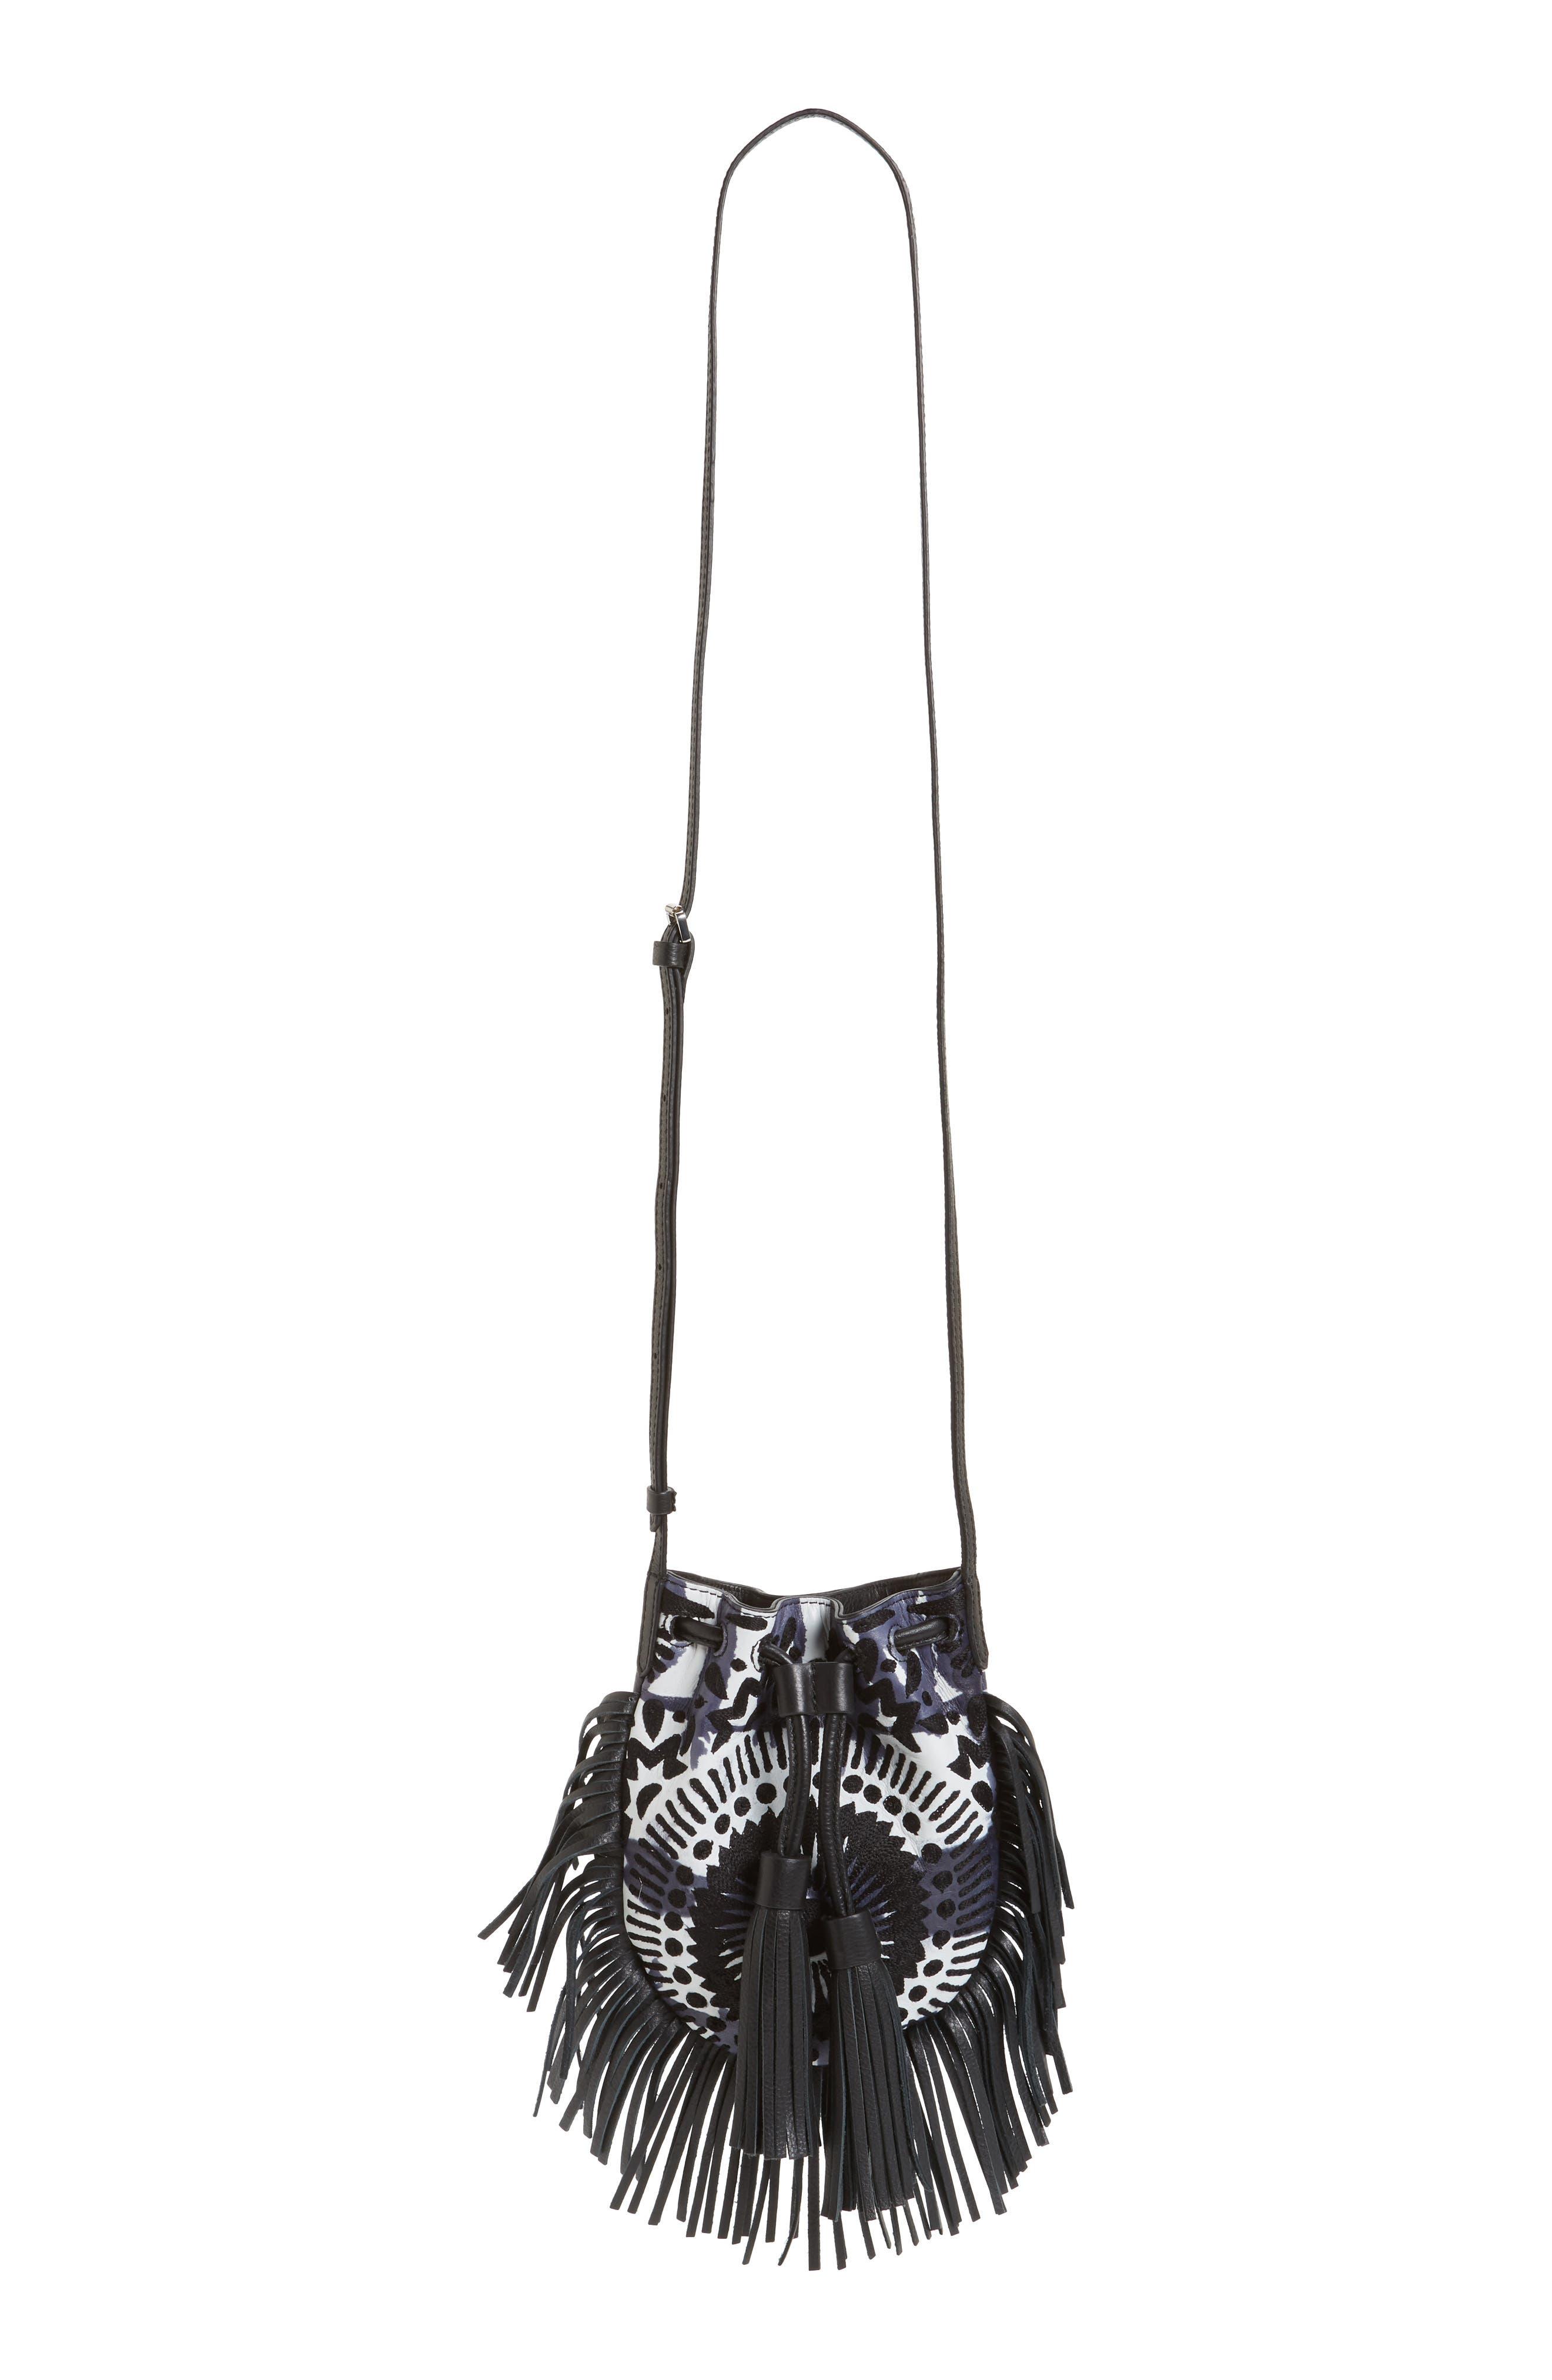 REBECCA MINKOFF Revel Phone Crossbody Bag, Main, color, 001